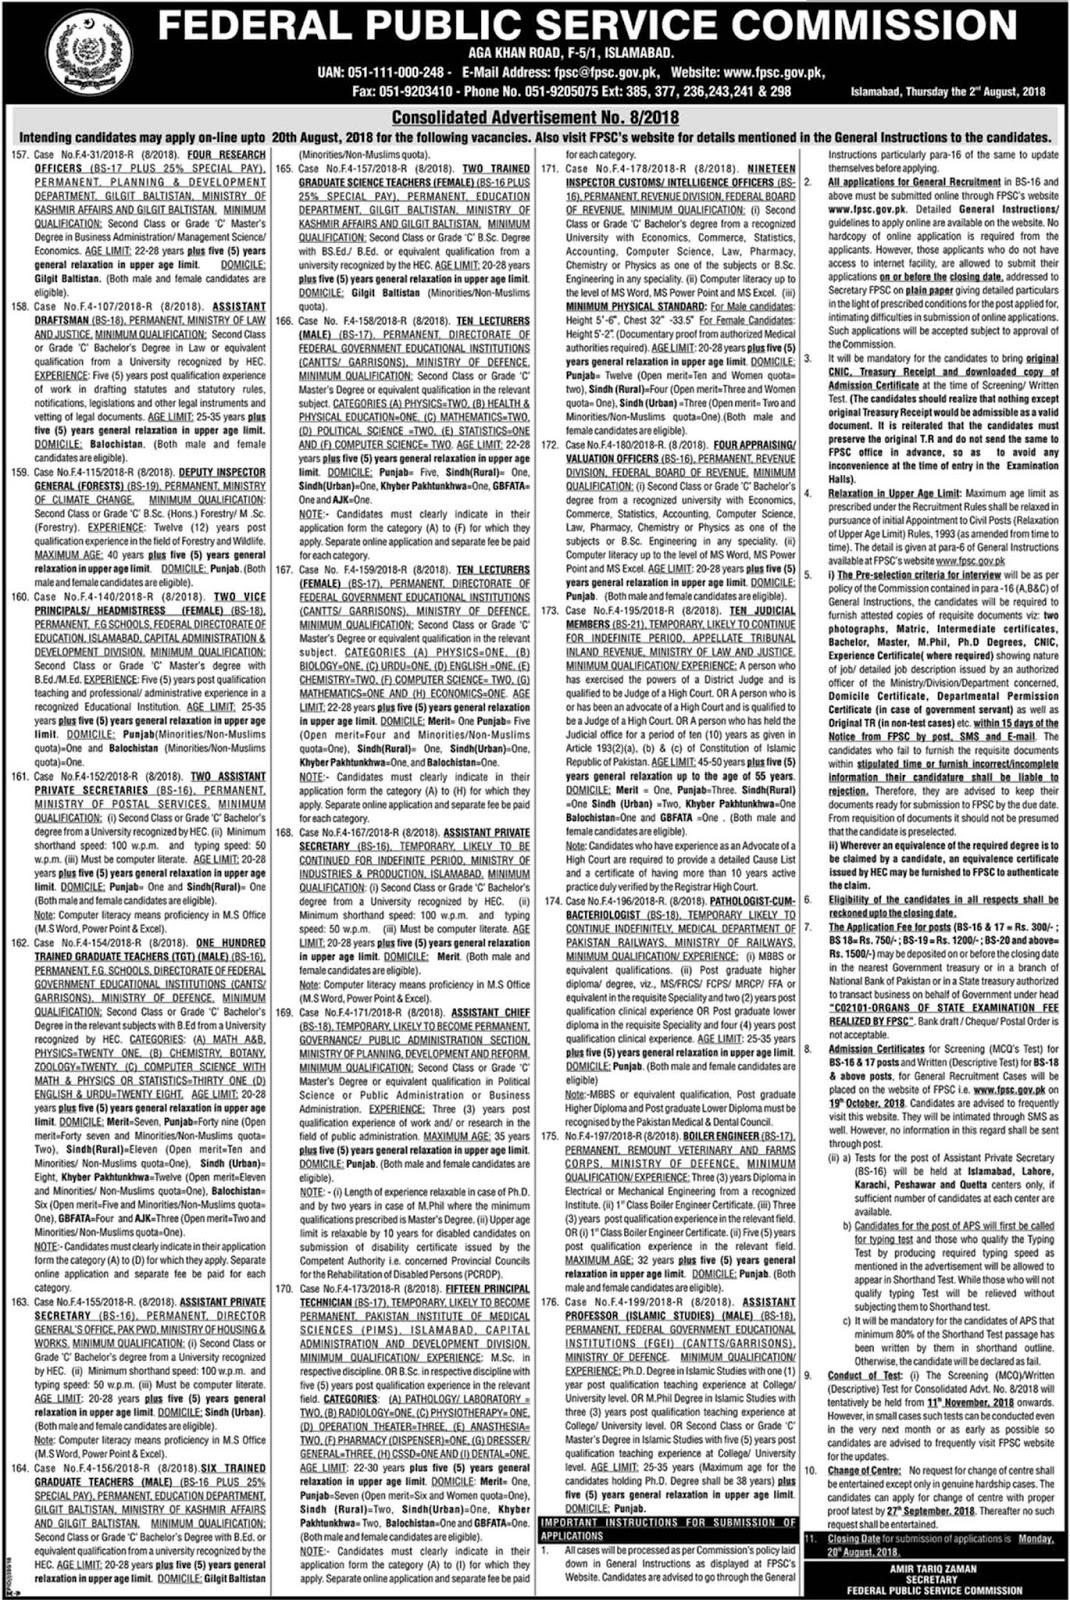 FPSC Federal Public Service Commission, Latest Jobs